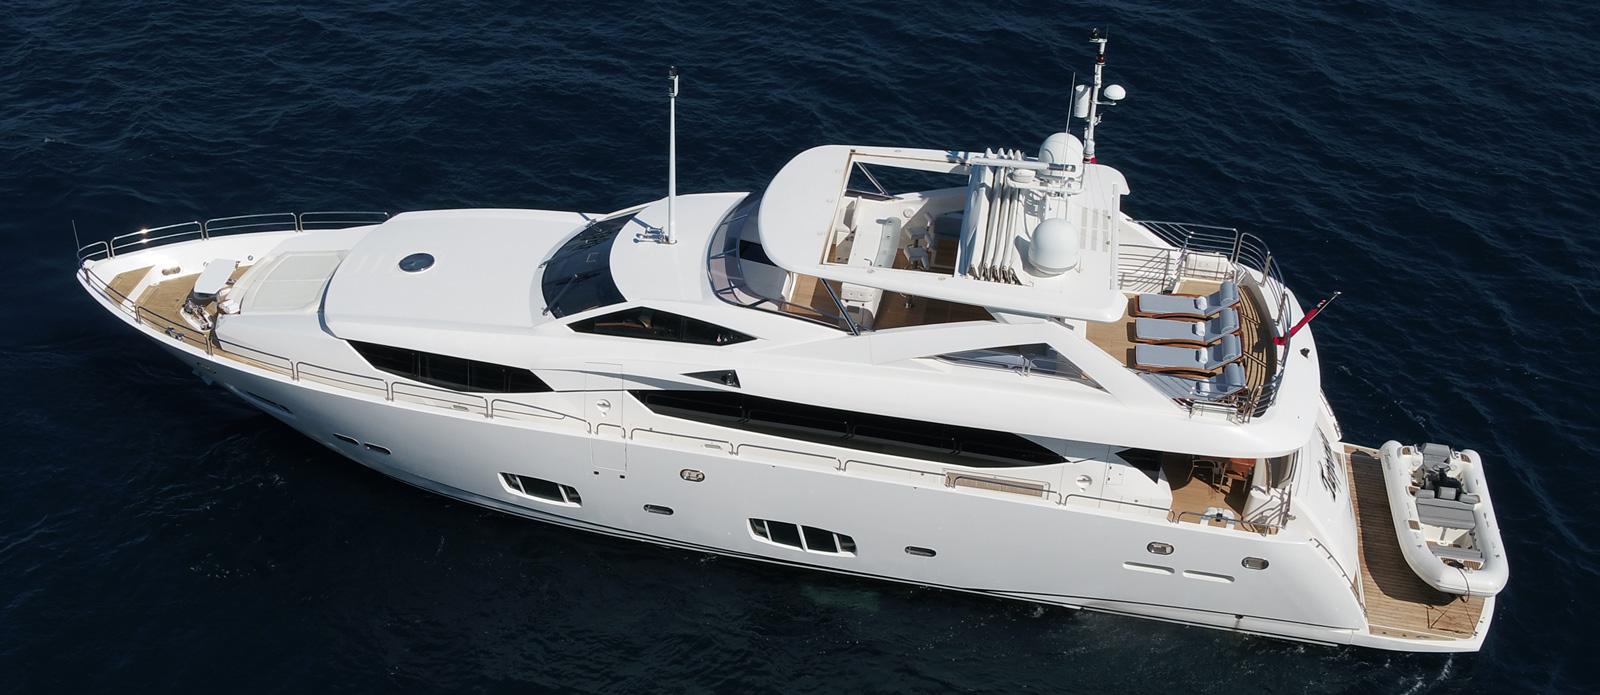 Sunseeker-30-Metre-Yacht-Tuppence---Overhead